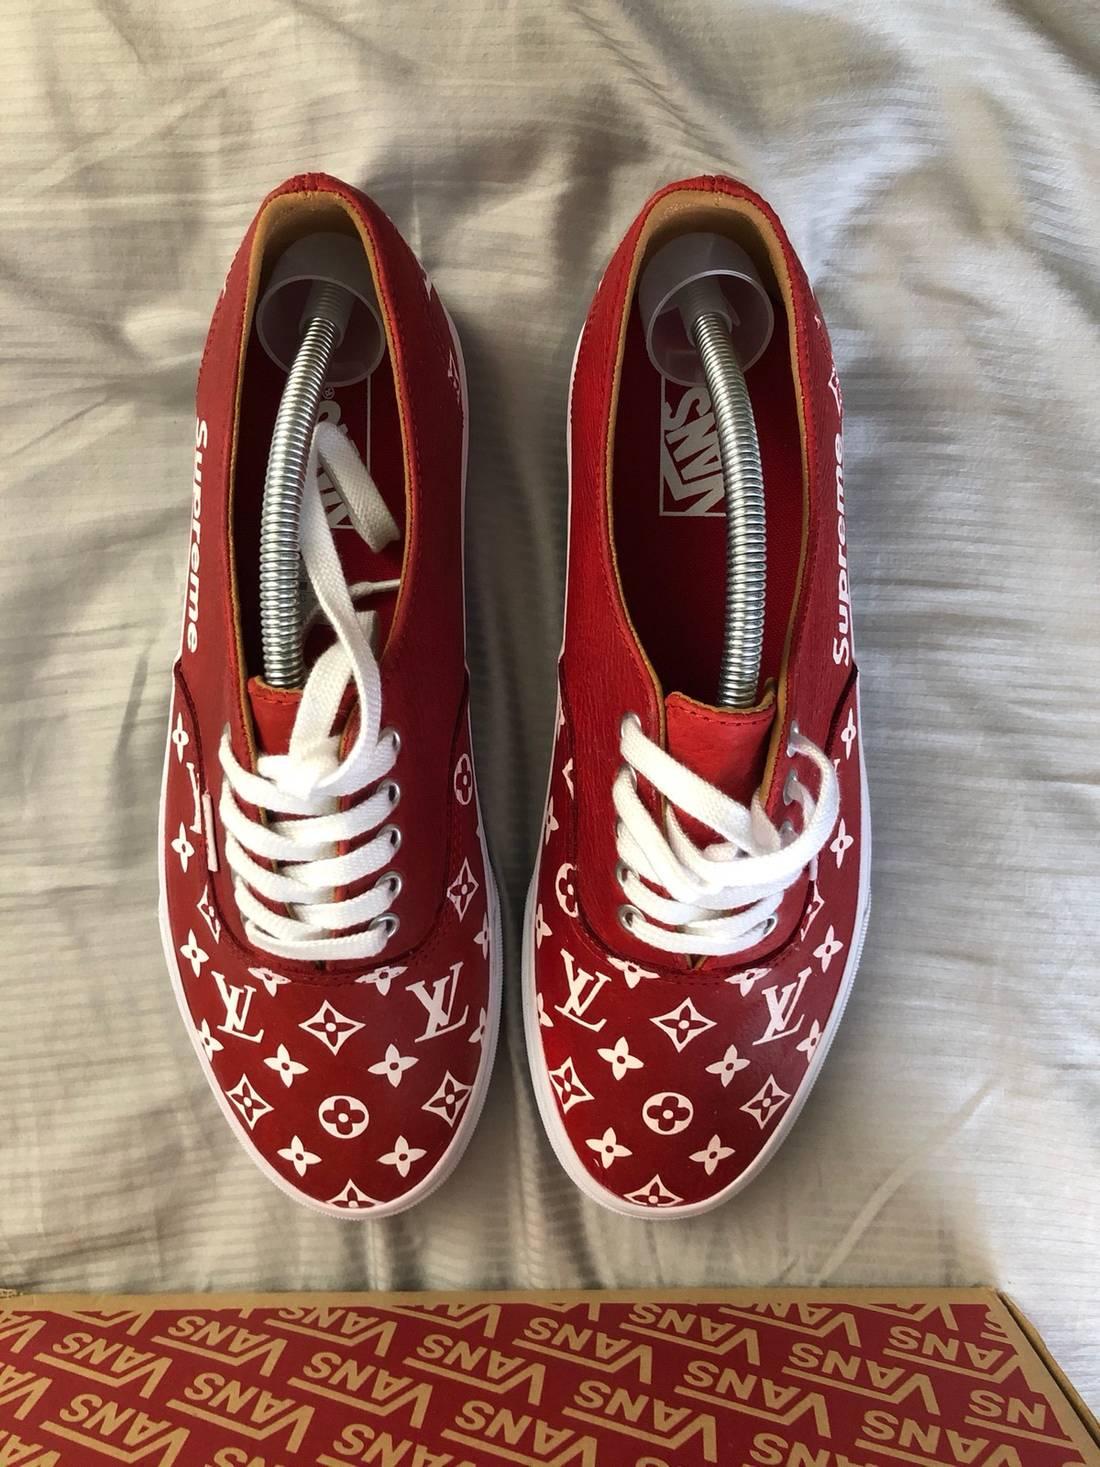 Vans FINAL DROP Custom Hand Painted Red White Supreme X Louis Vuitton Size